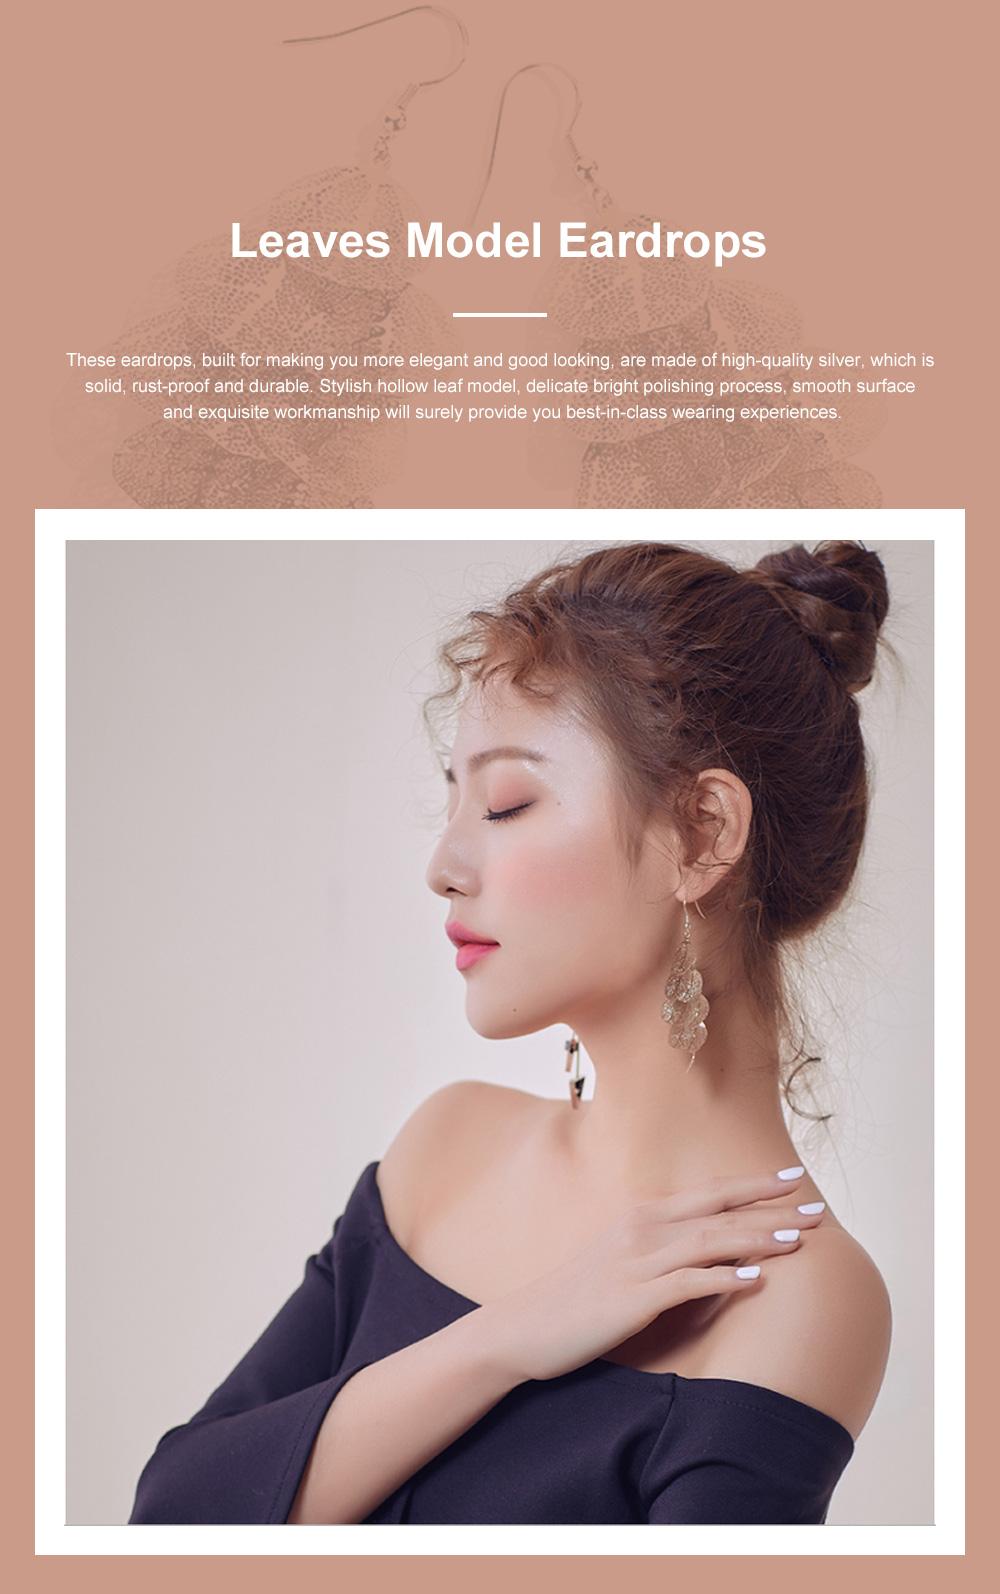 CAROMAY Stylish Elegant Vintage Delicate Hollow Leaf Model Tassels Silver Eardrops Earrings with Mirror Polishing Electroplating 0